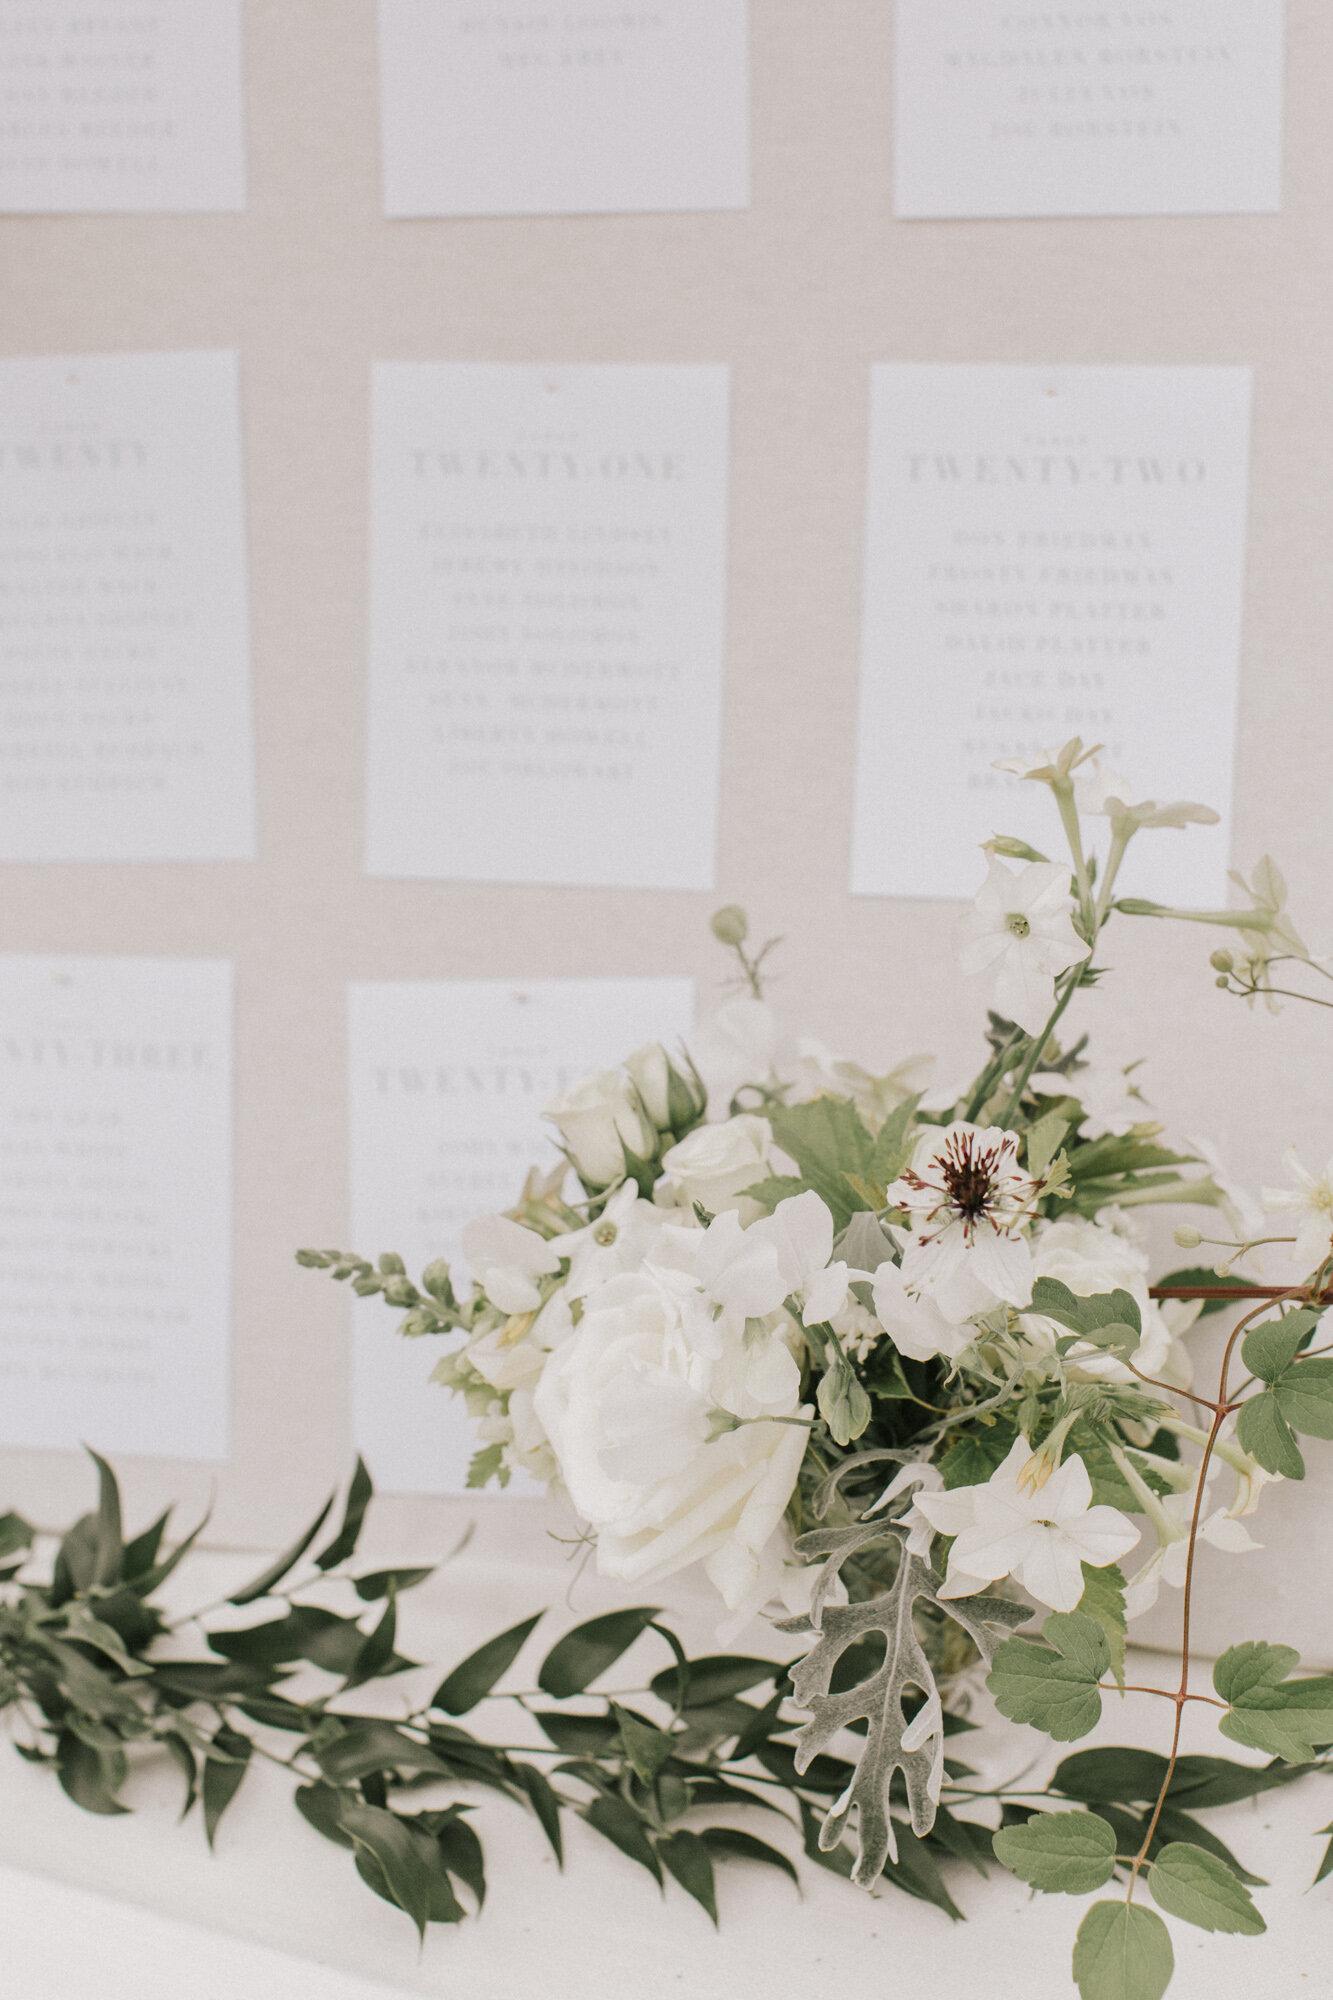 Chebeague+Island+Inn+Wedding+Maine+Jamie+Mercurio+Photography-0089.jpg